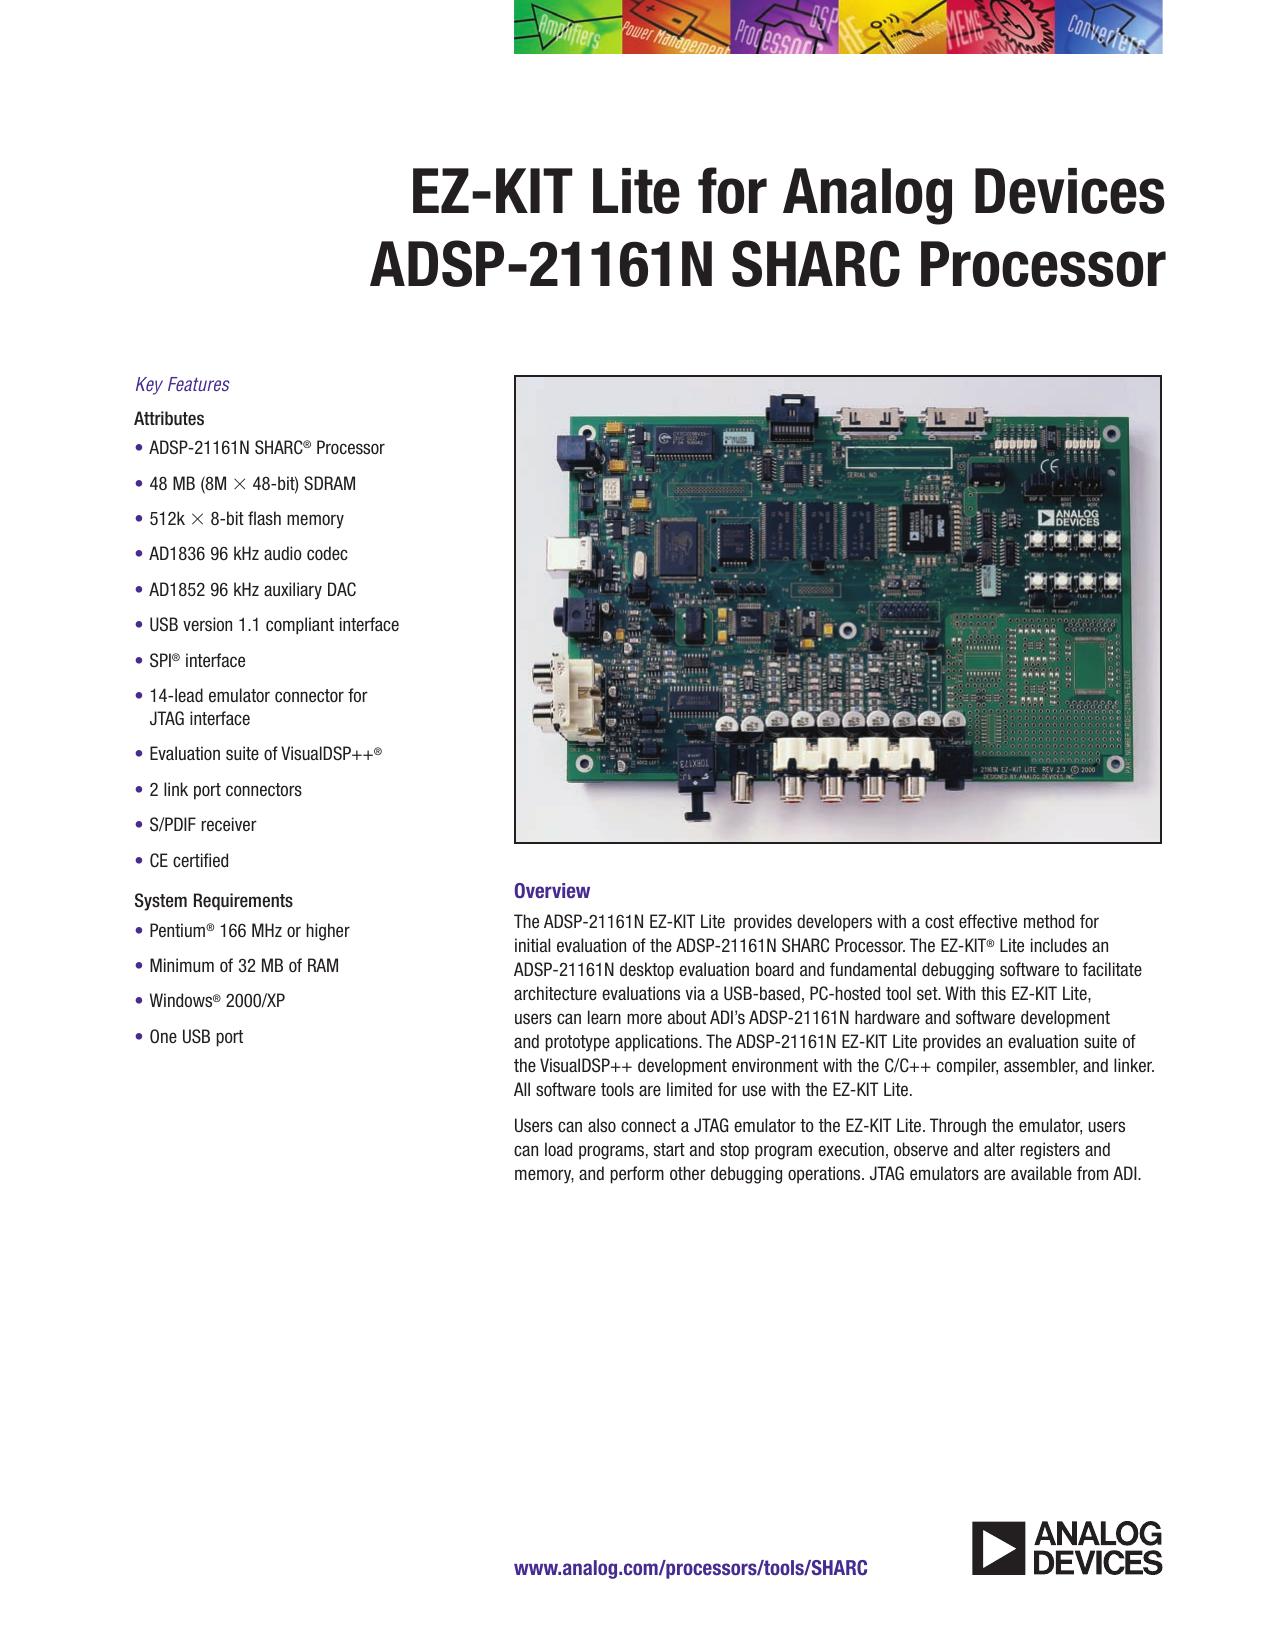 EZ-KIT Lite for Analog Devices ADSP-21161N SHARC Processor